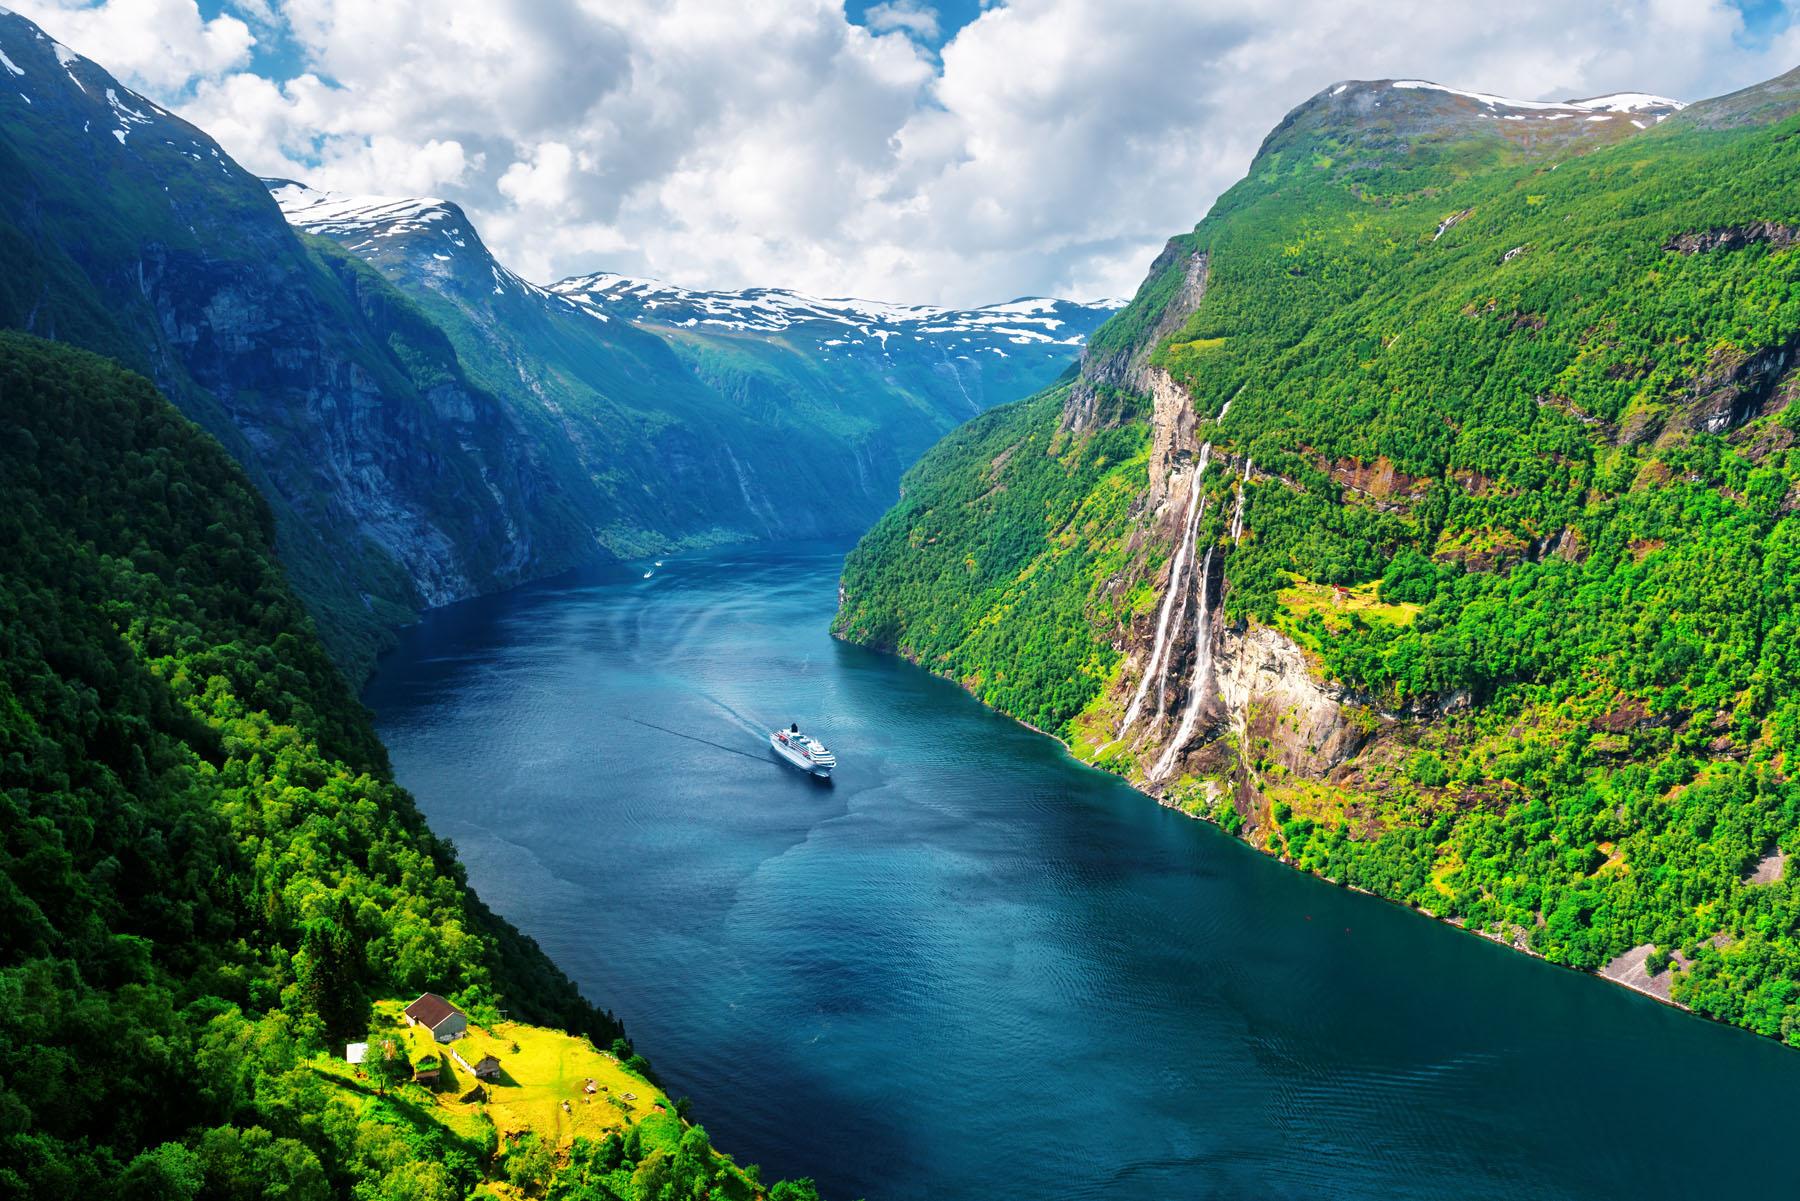 Norway-Geiranger_1013519491